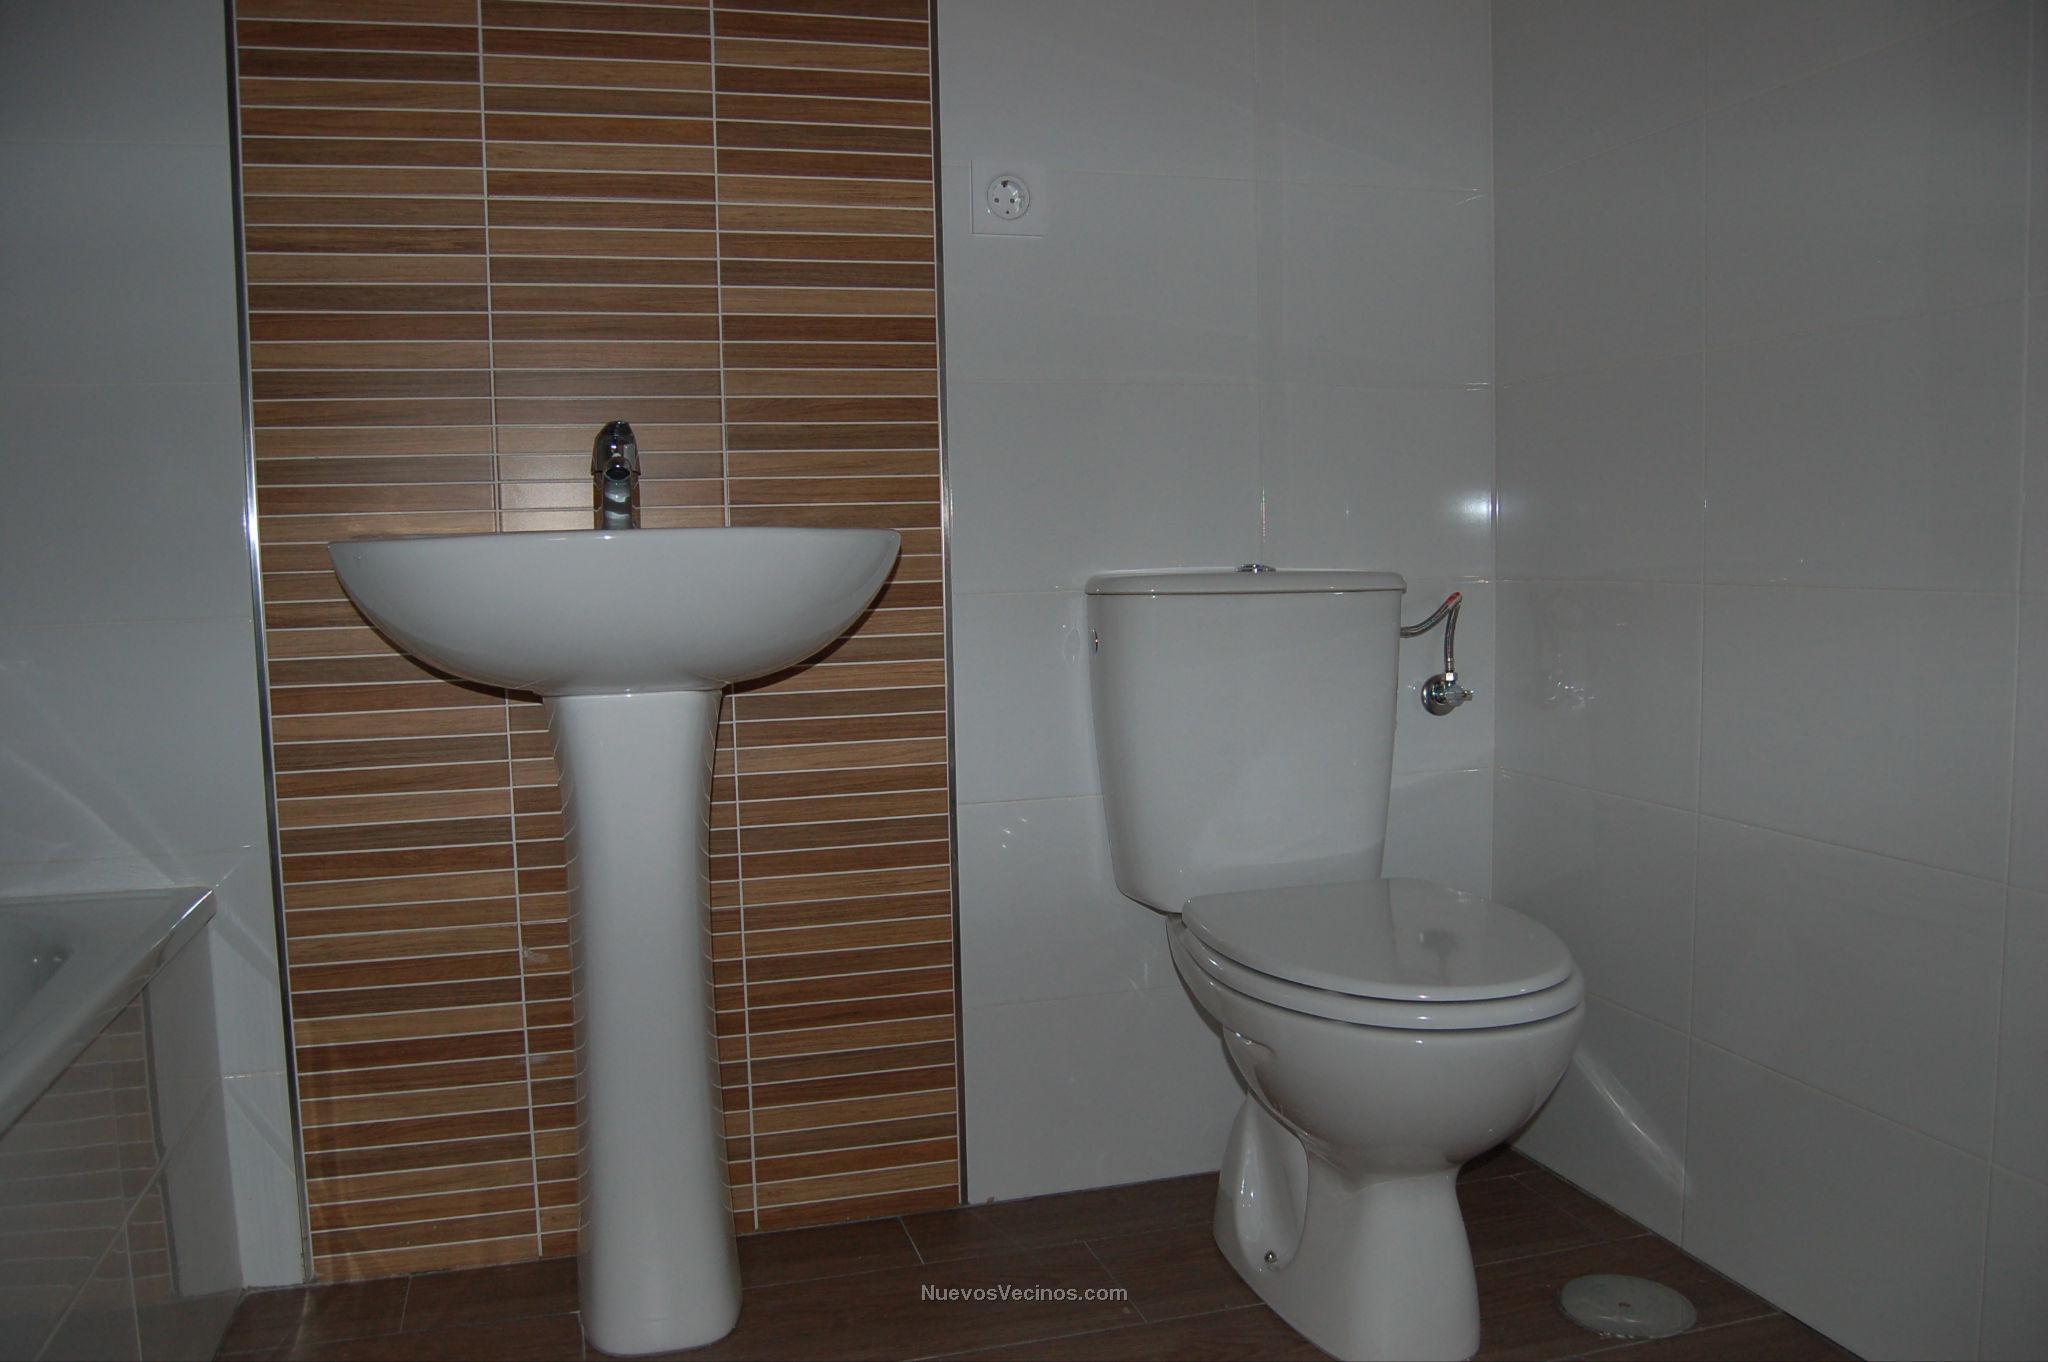 Baño Pequeno Original:Vimcorsa Mirabueno 123 VPO – Fotos – Cuarto Baño Pequeño II